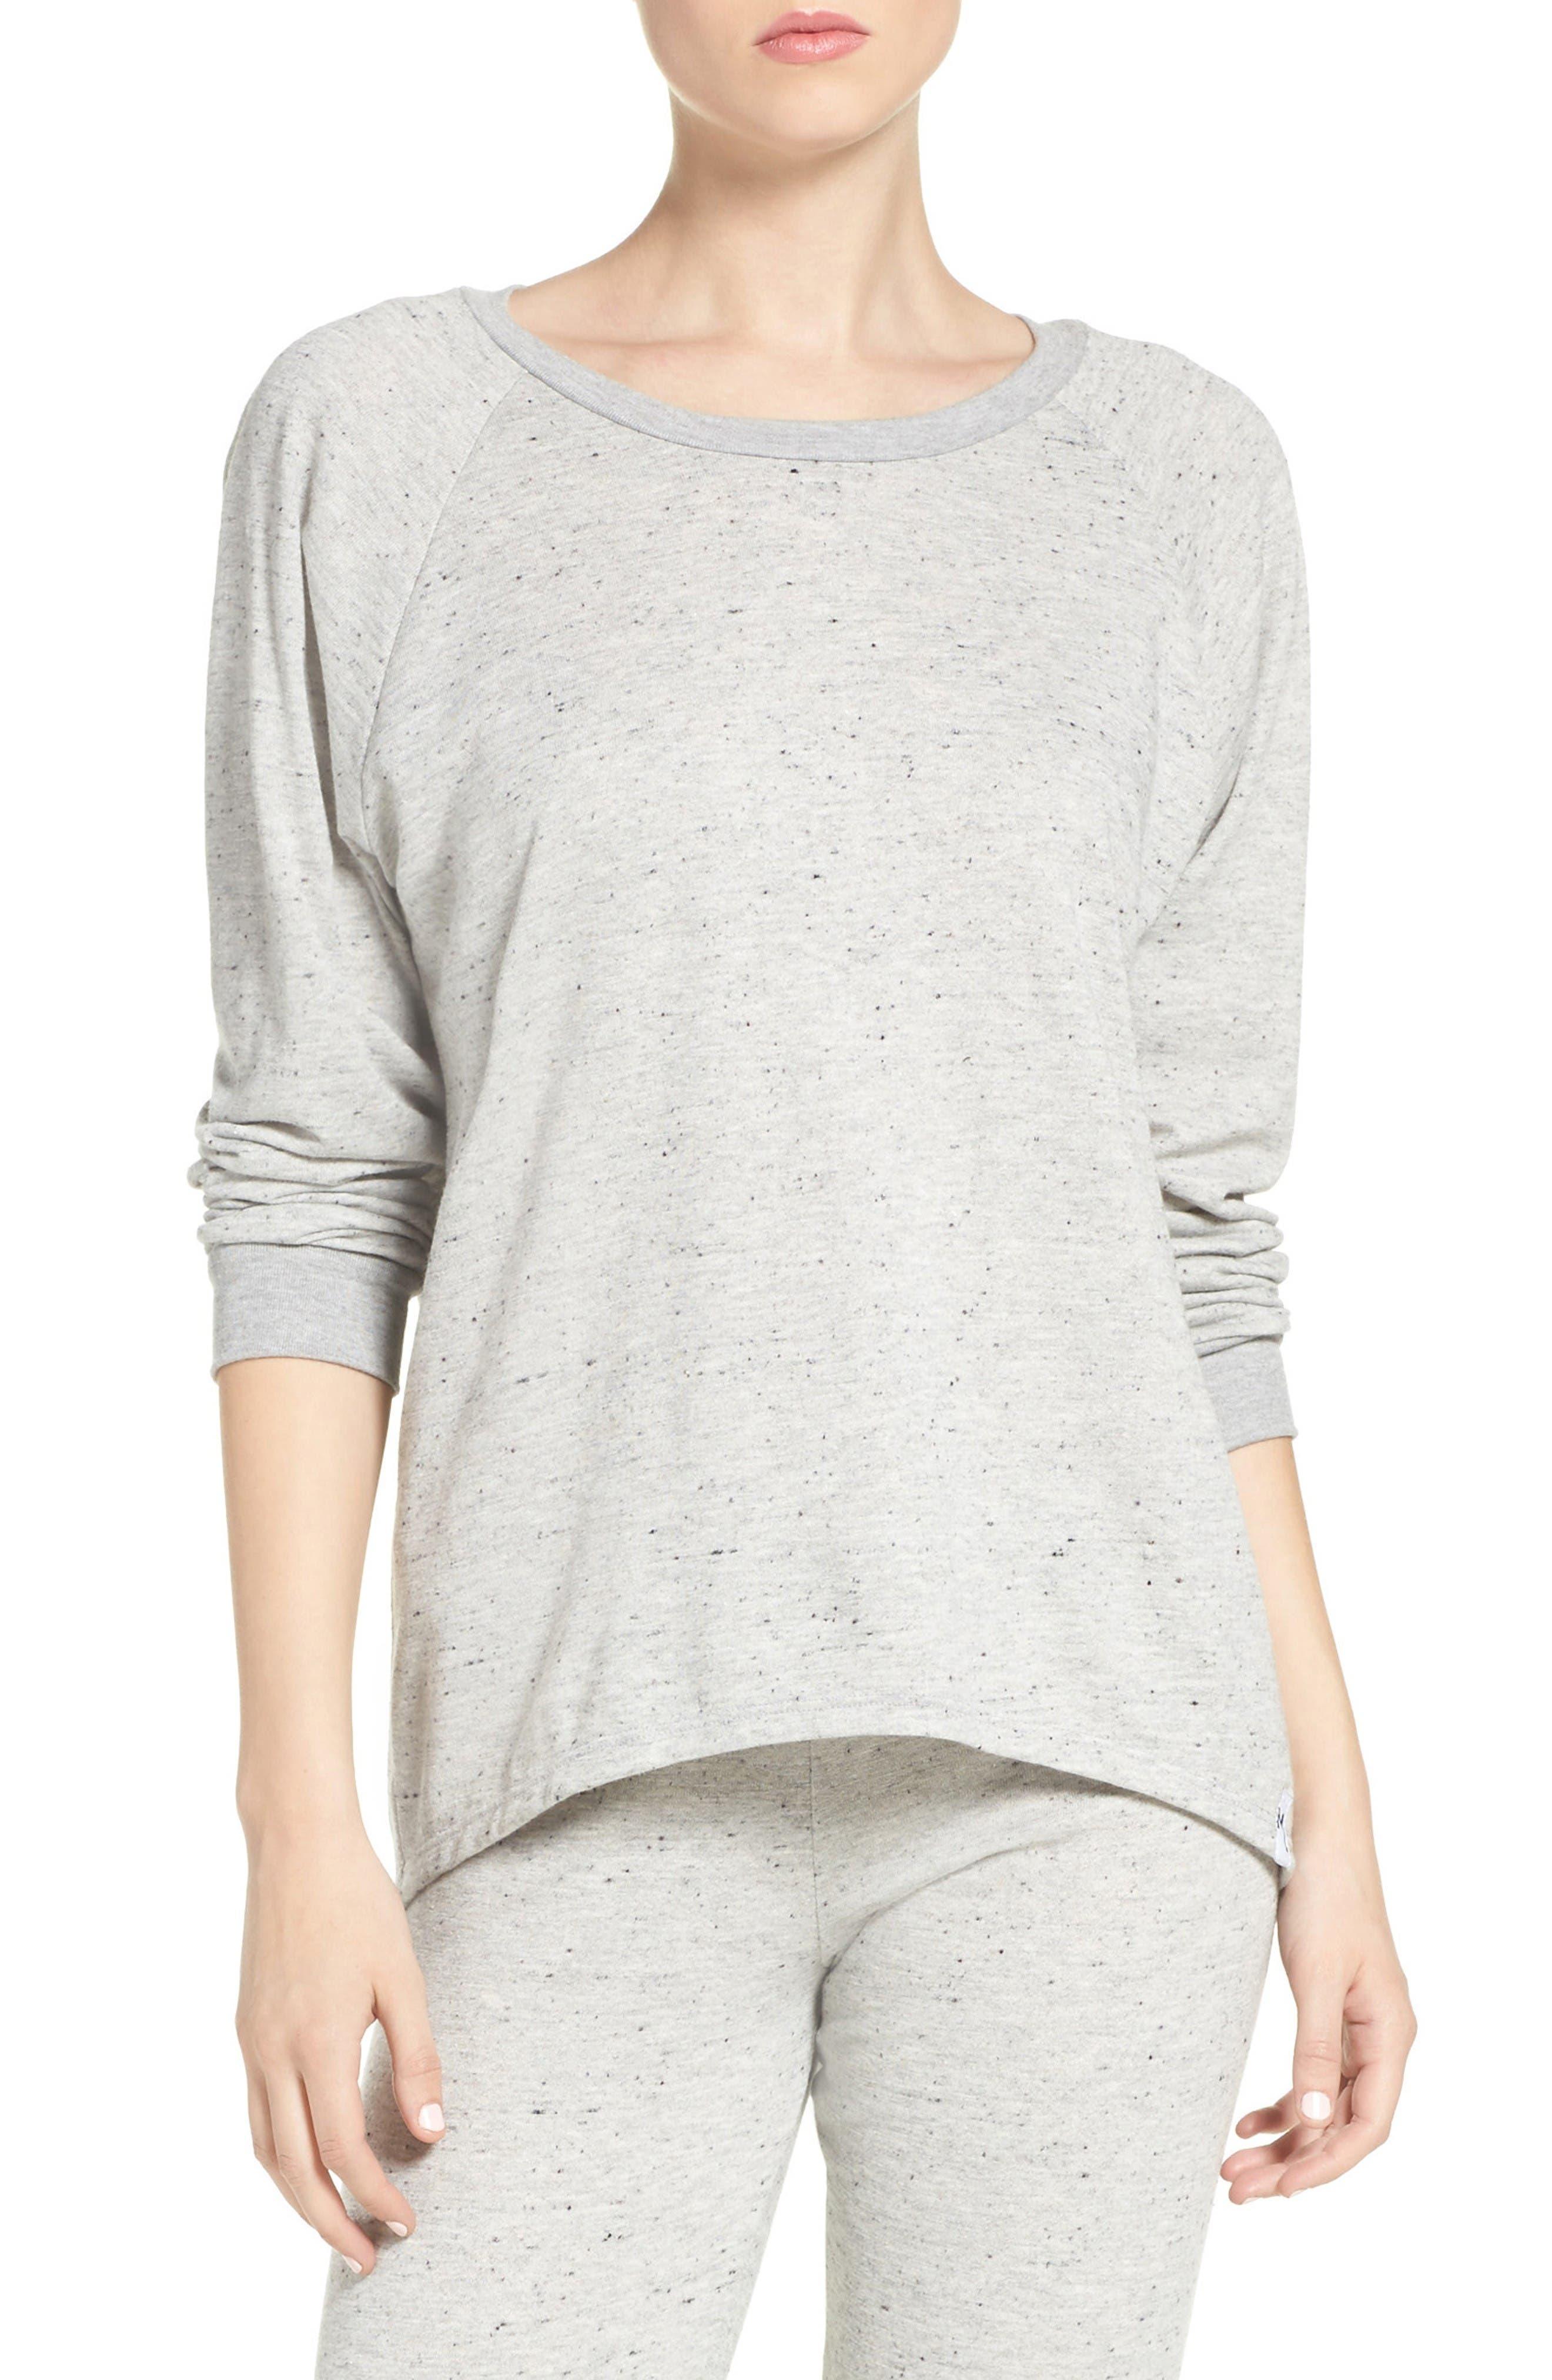 Zuma Lounge Sweatshirt,                         Main,                         color, Heather Grey